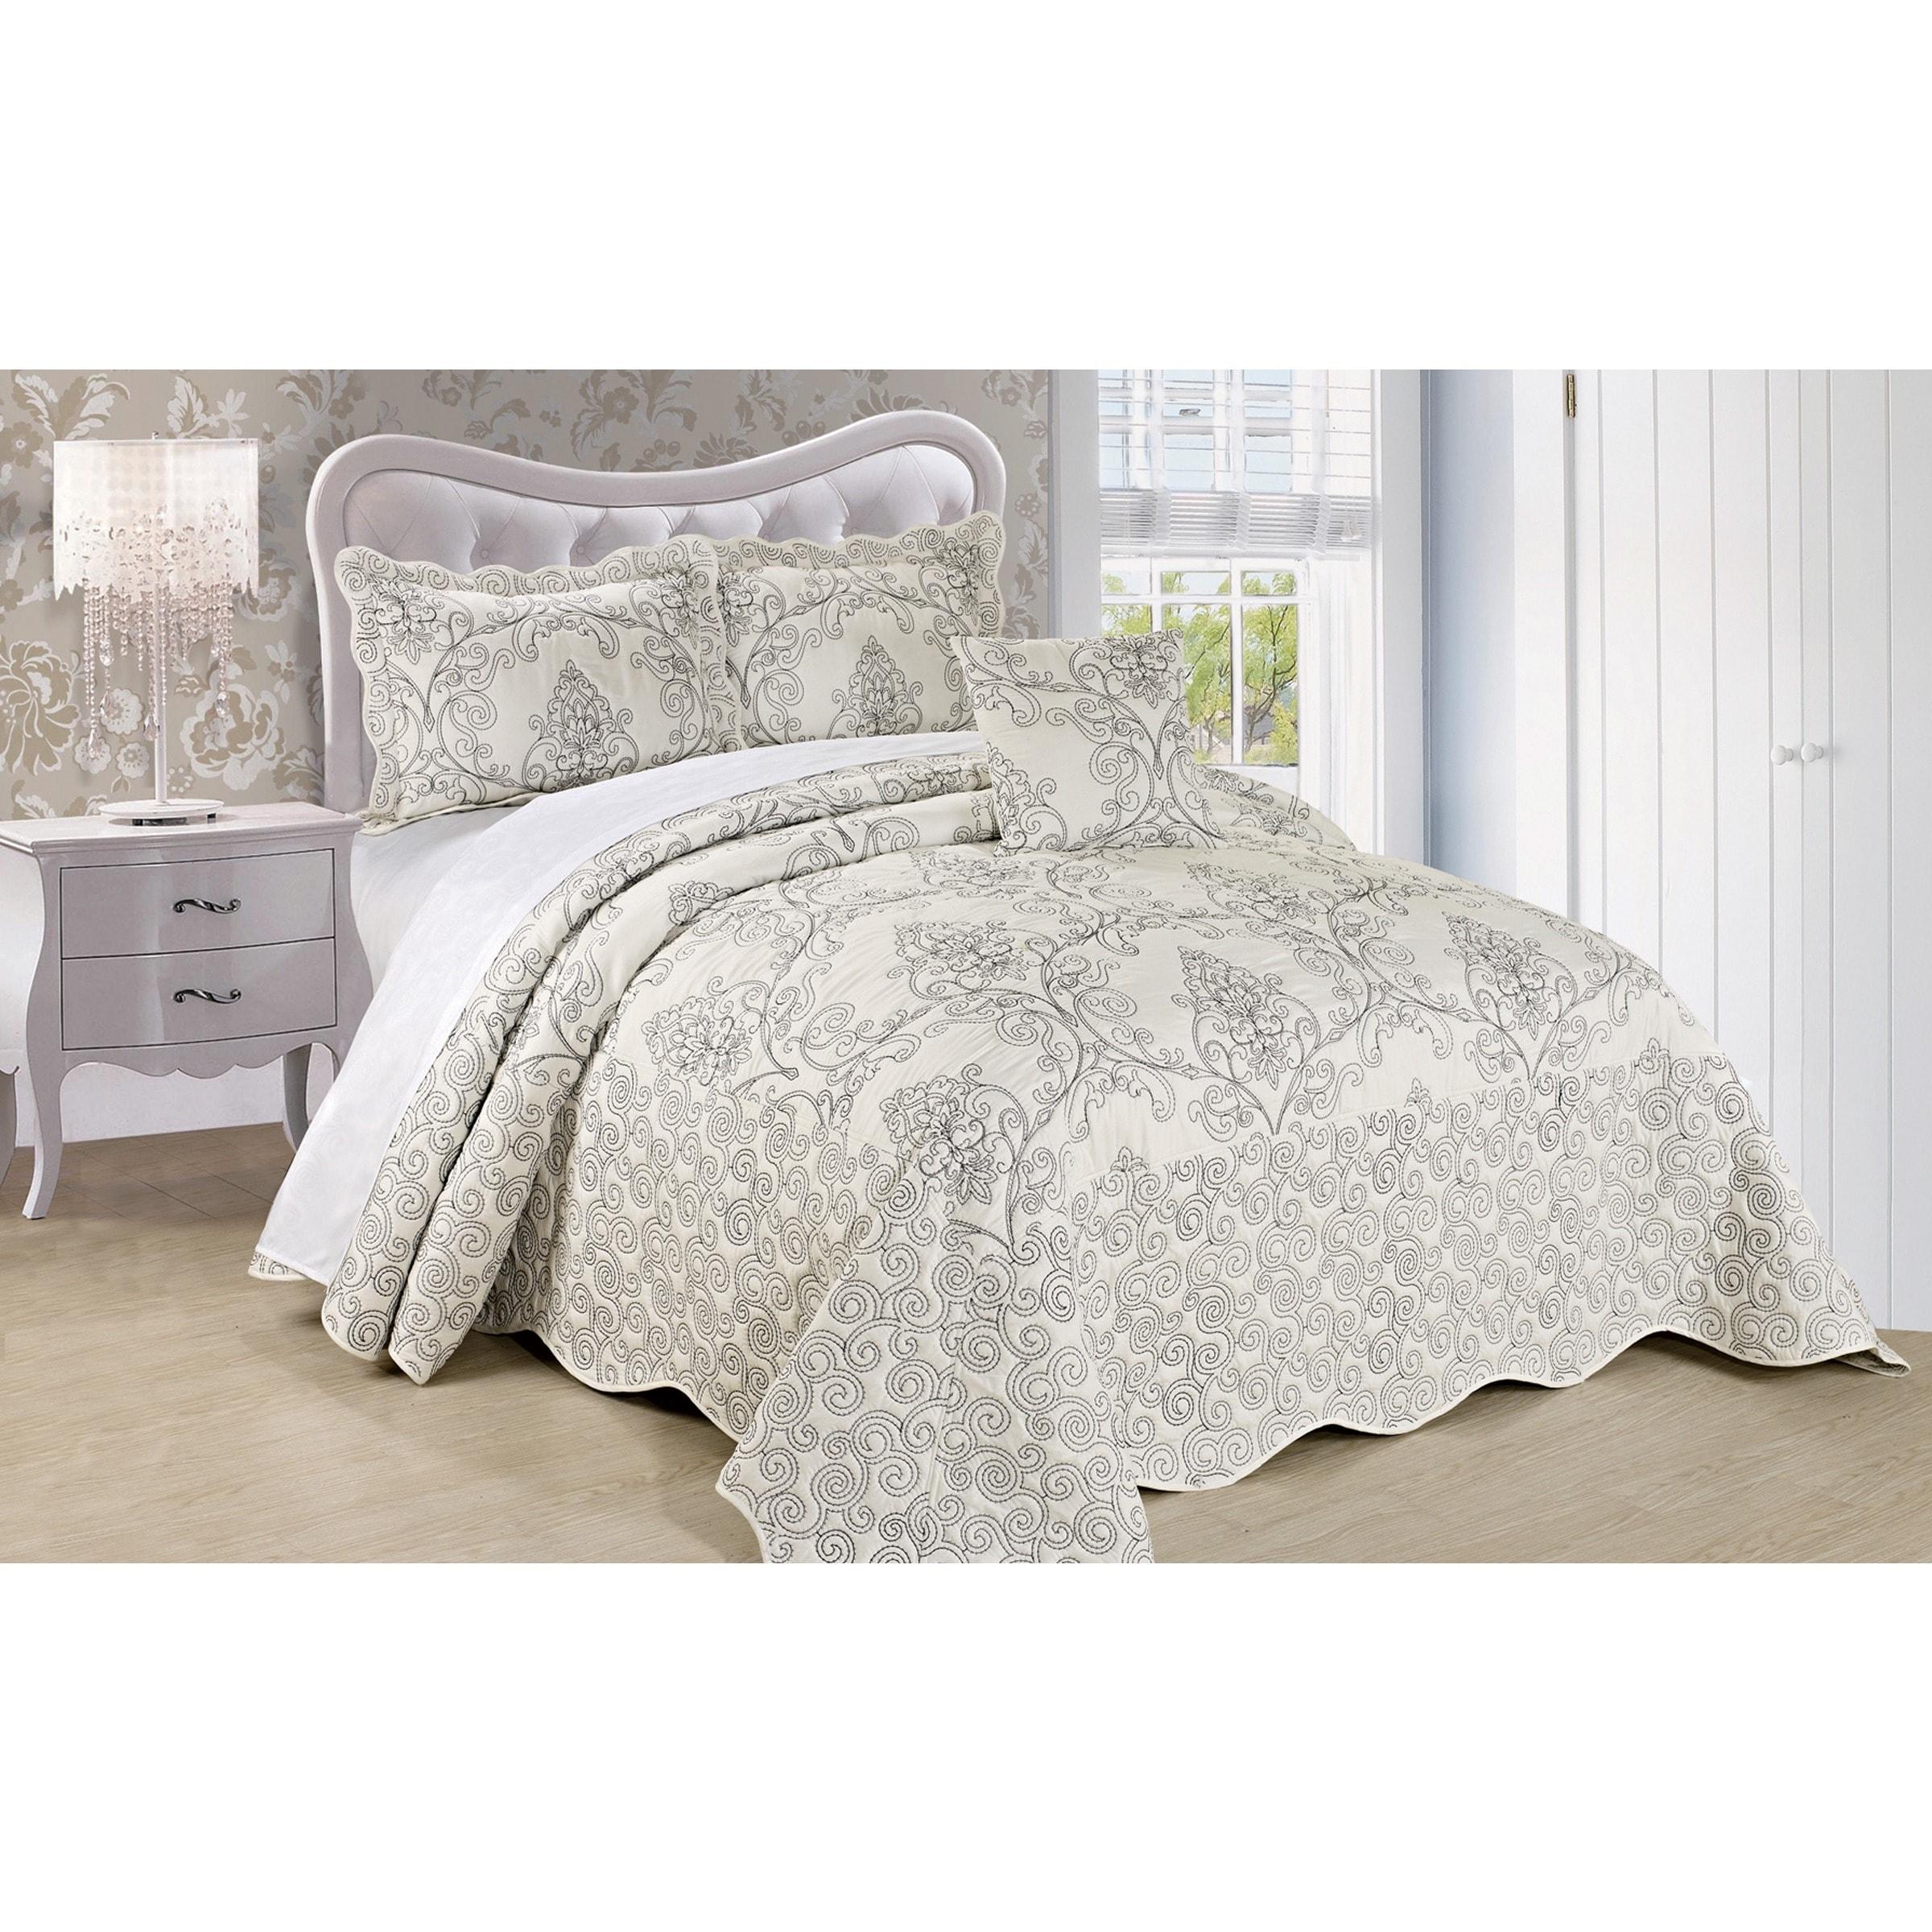 Serenta Damask 4-piece Bedspread Set (Antique White - Kin...